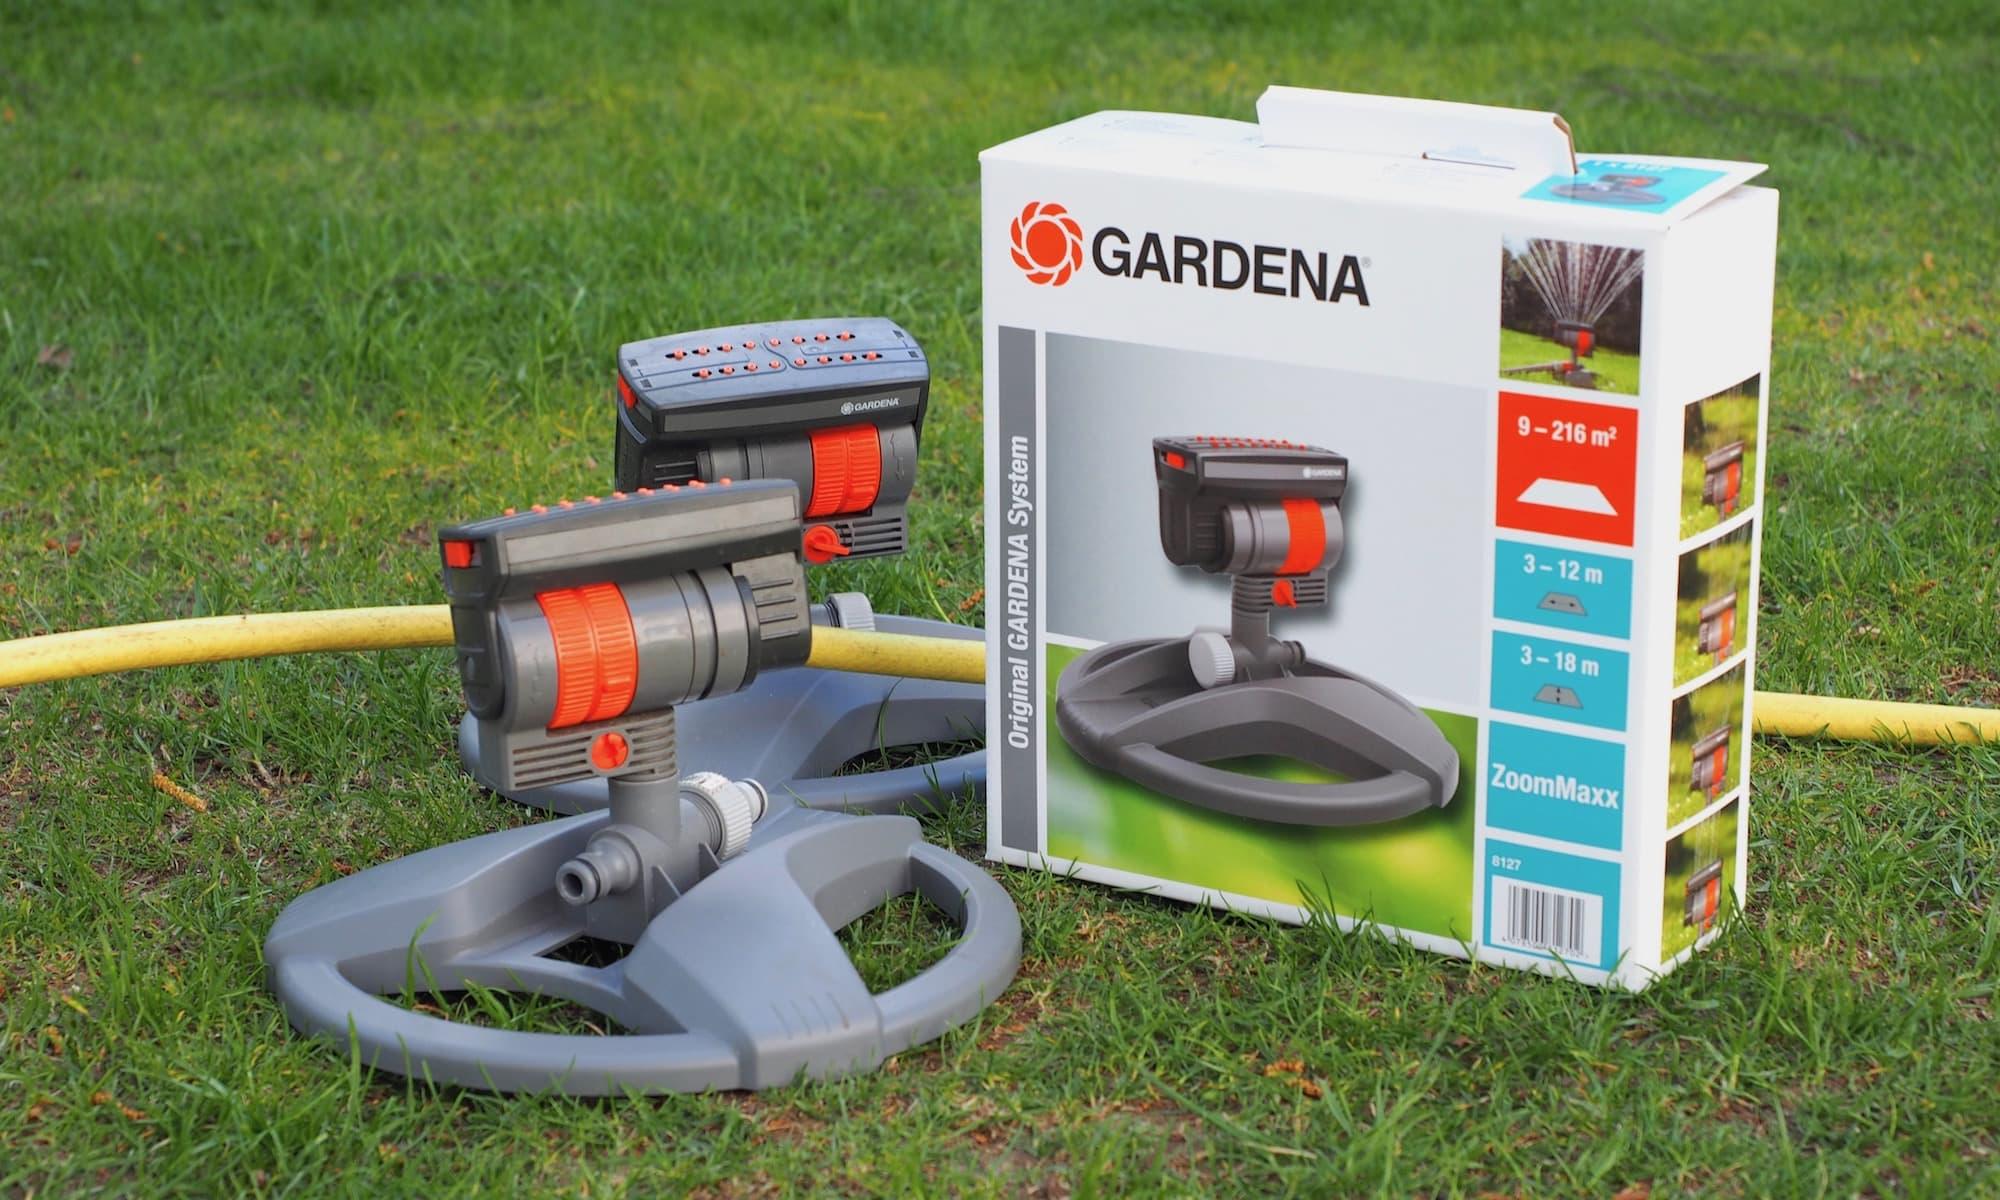 Gardena Viereckregner ZoomMaxx | Foto: konsensor.de